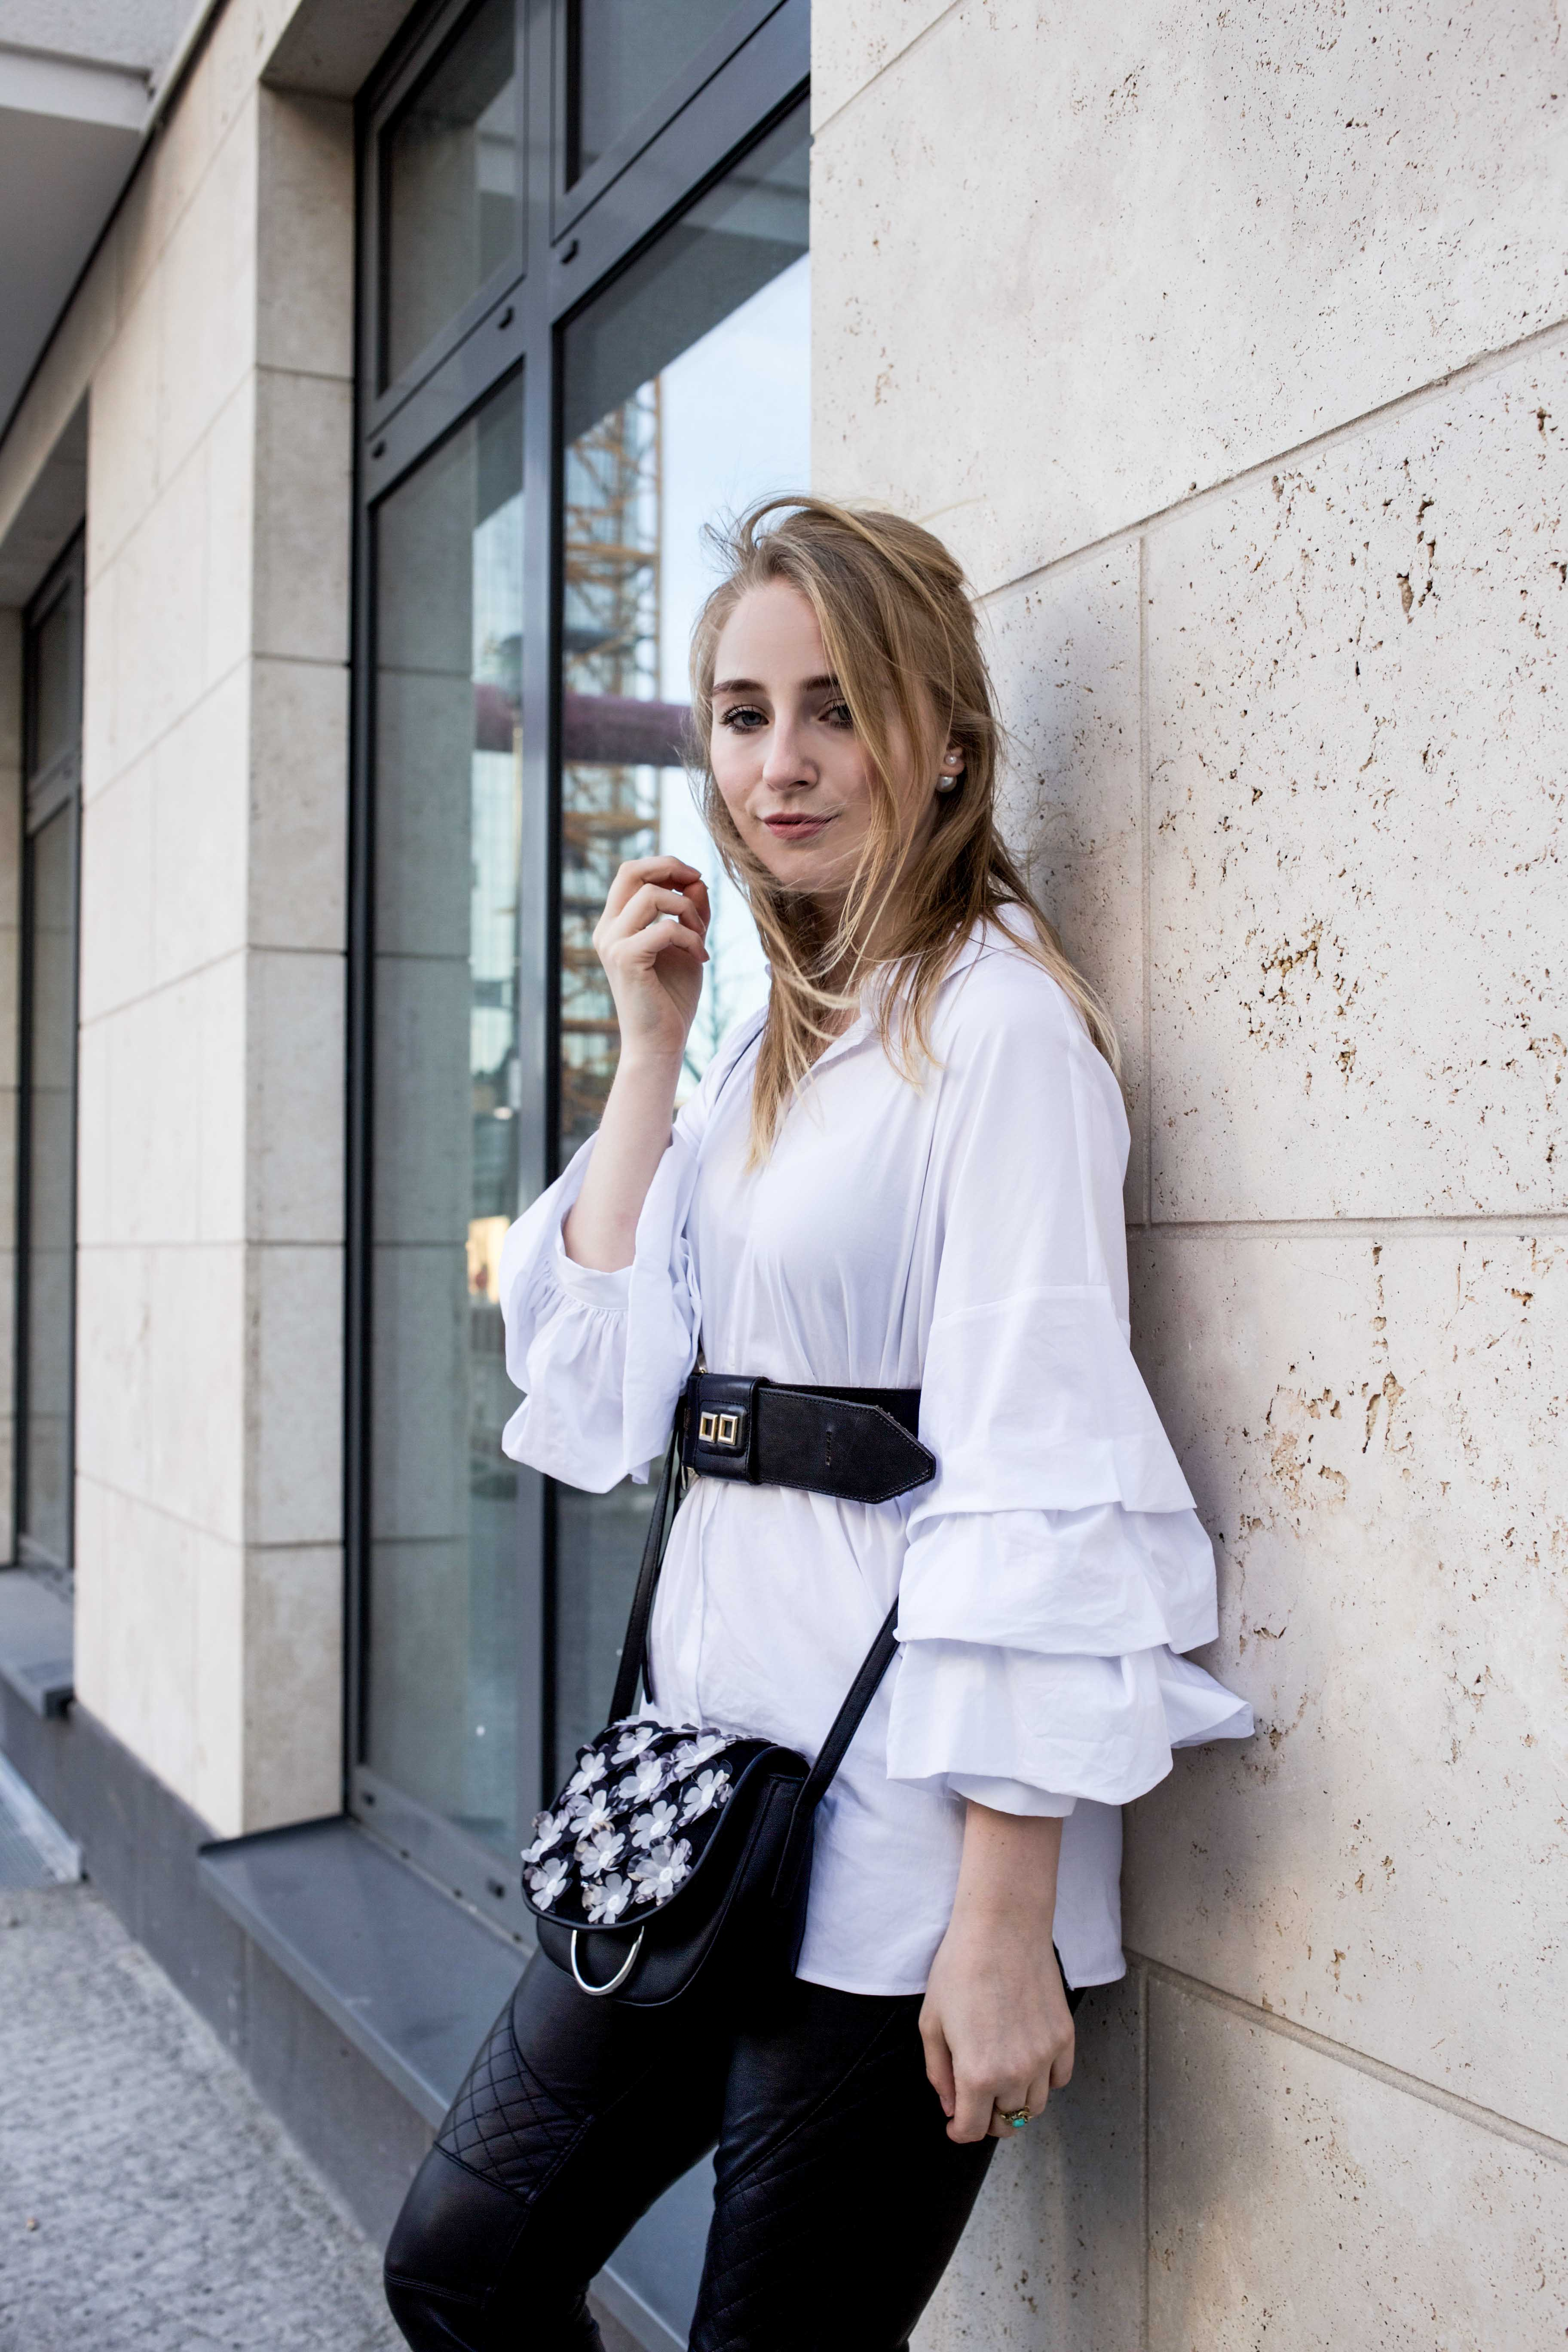 trendreport-weiße-bluse-trompetenärmel-fashionblog-ootd-modeblog-berlin_8866